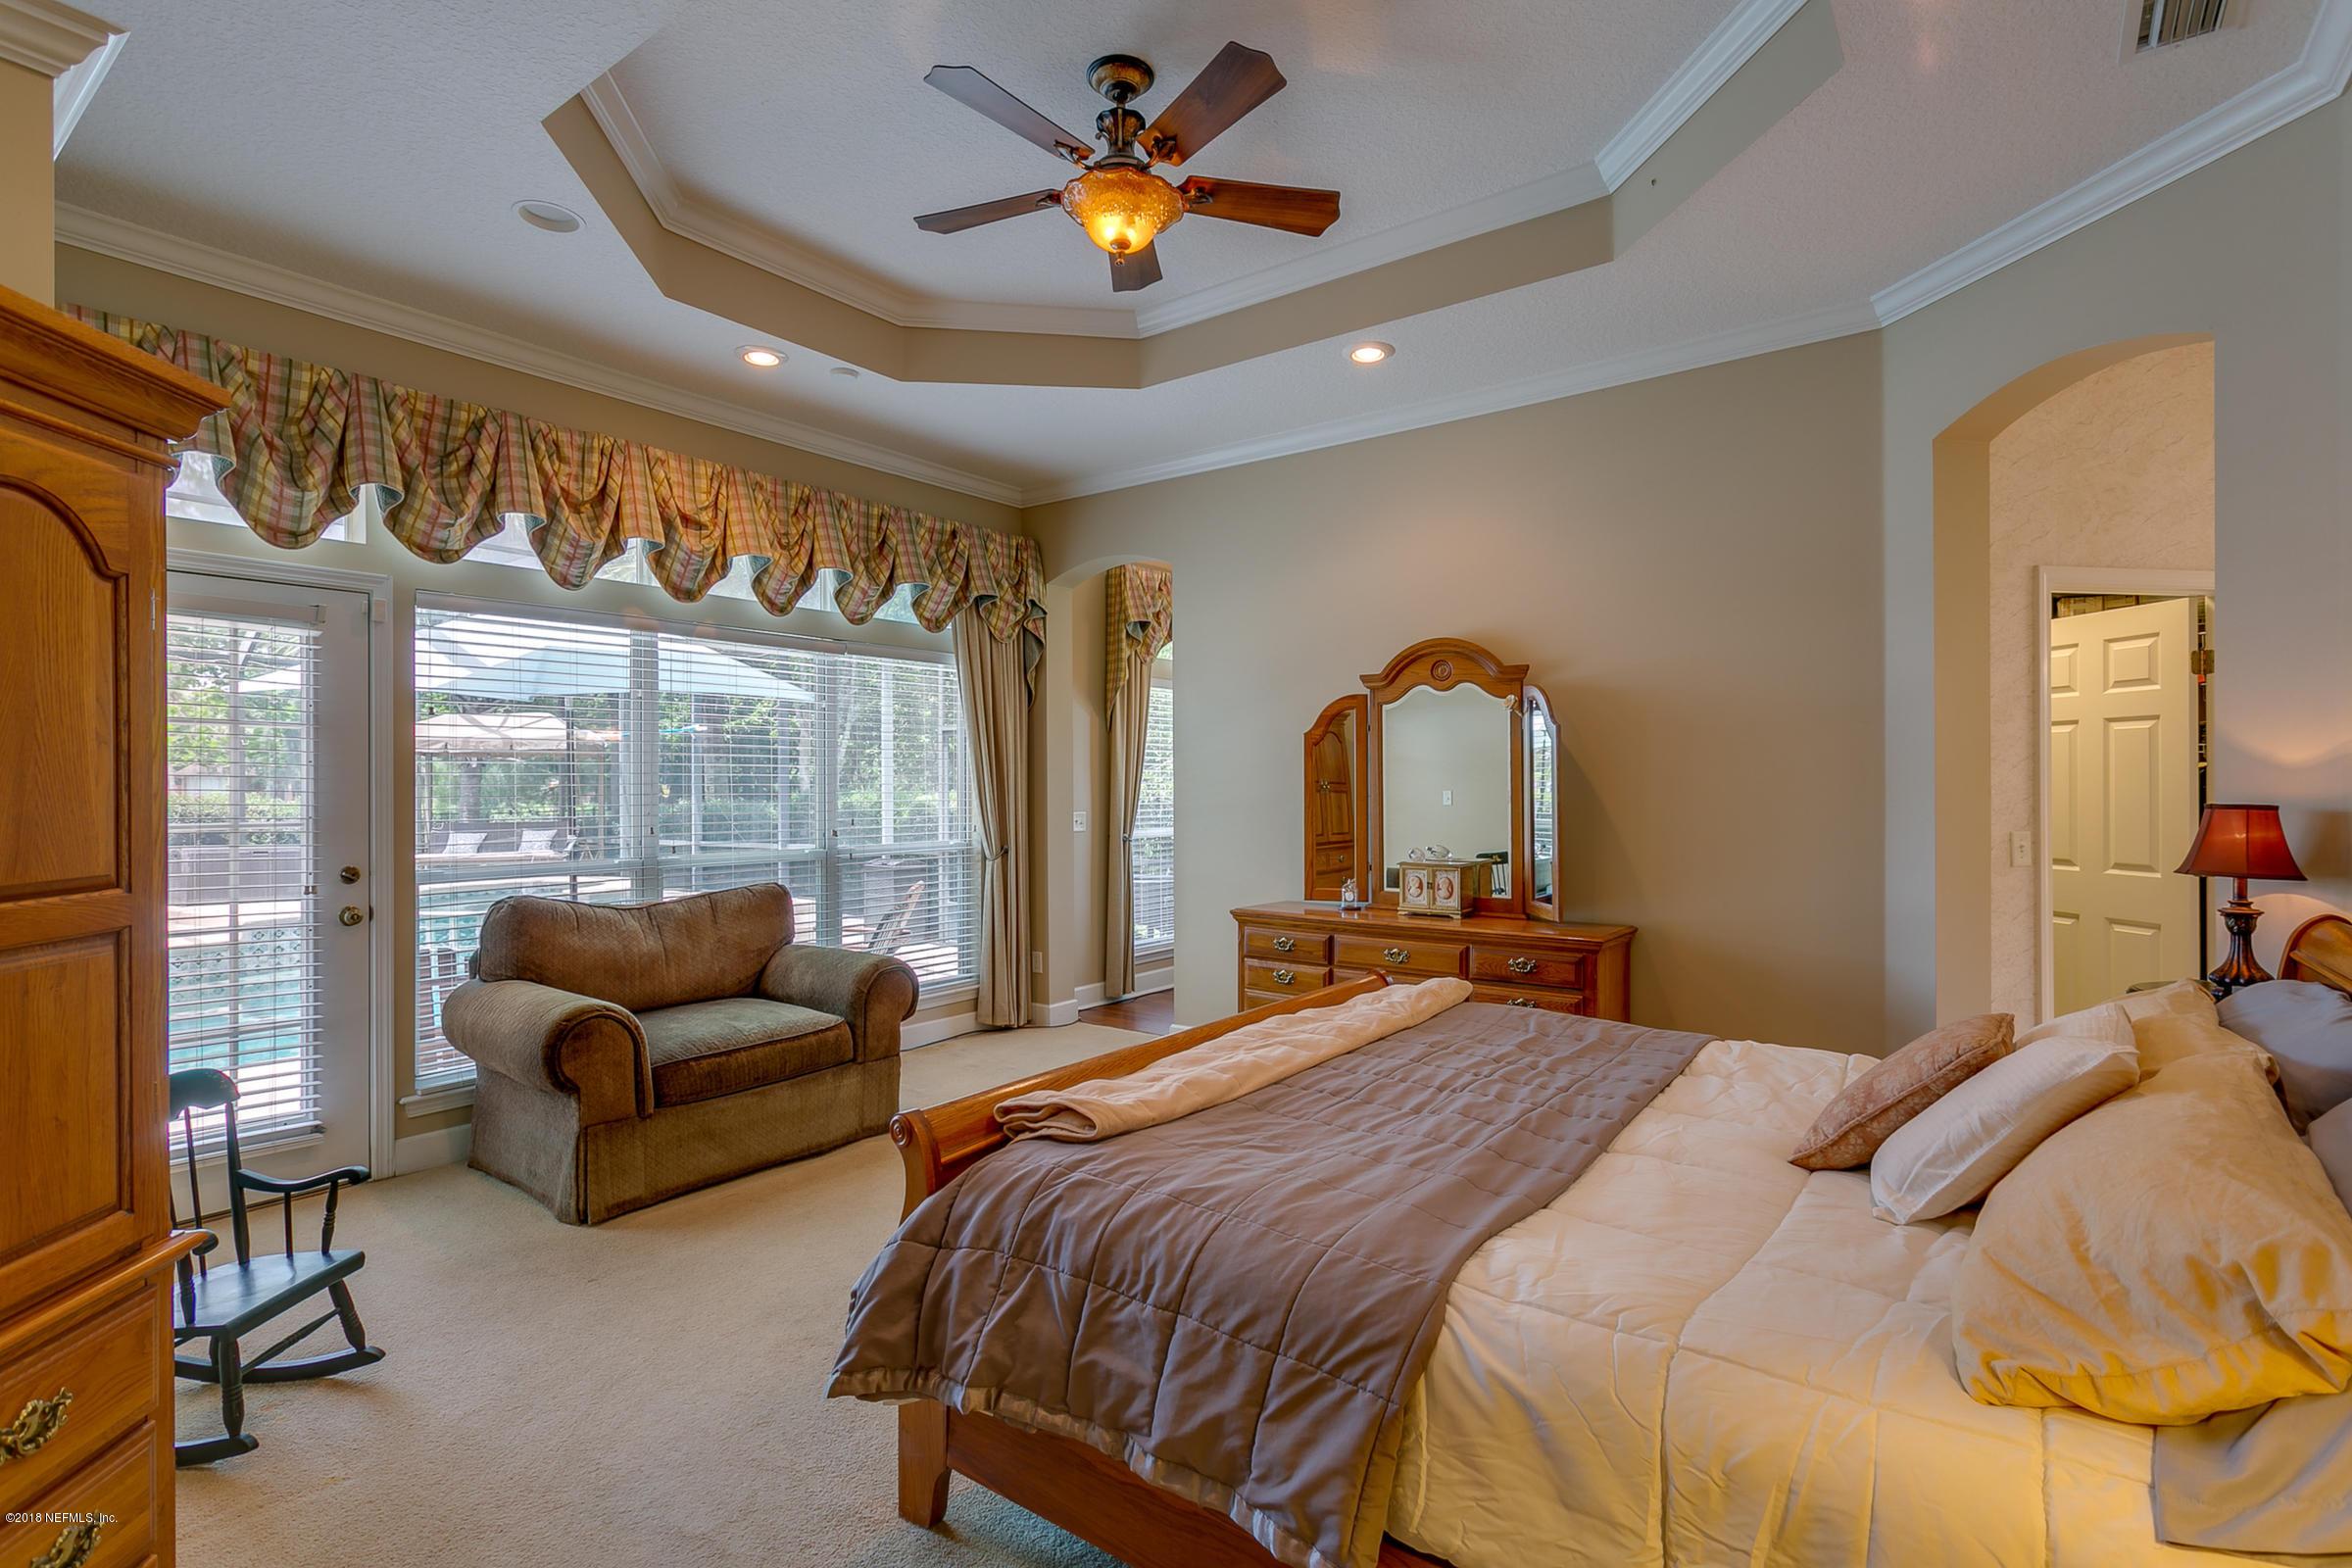 1312 OAKLANDING, FLEMING ISLAND, FLORIDA 32003, 6 Bedrooms Bedrooms, ,4 BathroomsBathrooms,Residential - single family,For sale,OAKLANDING,943357